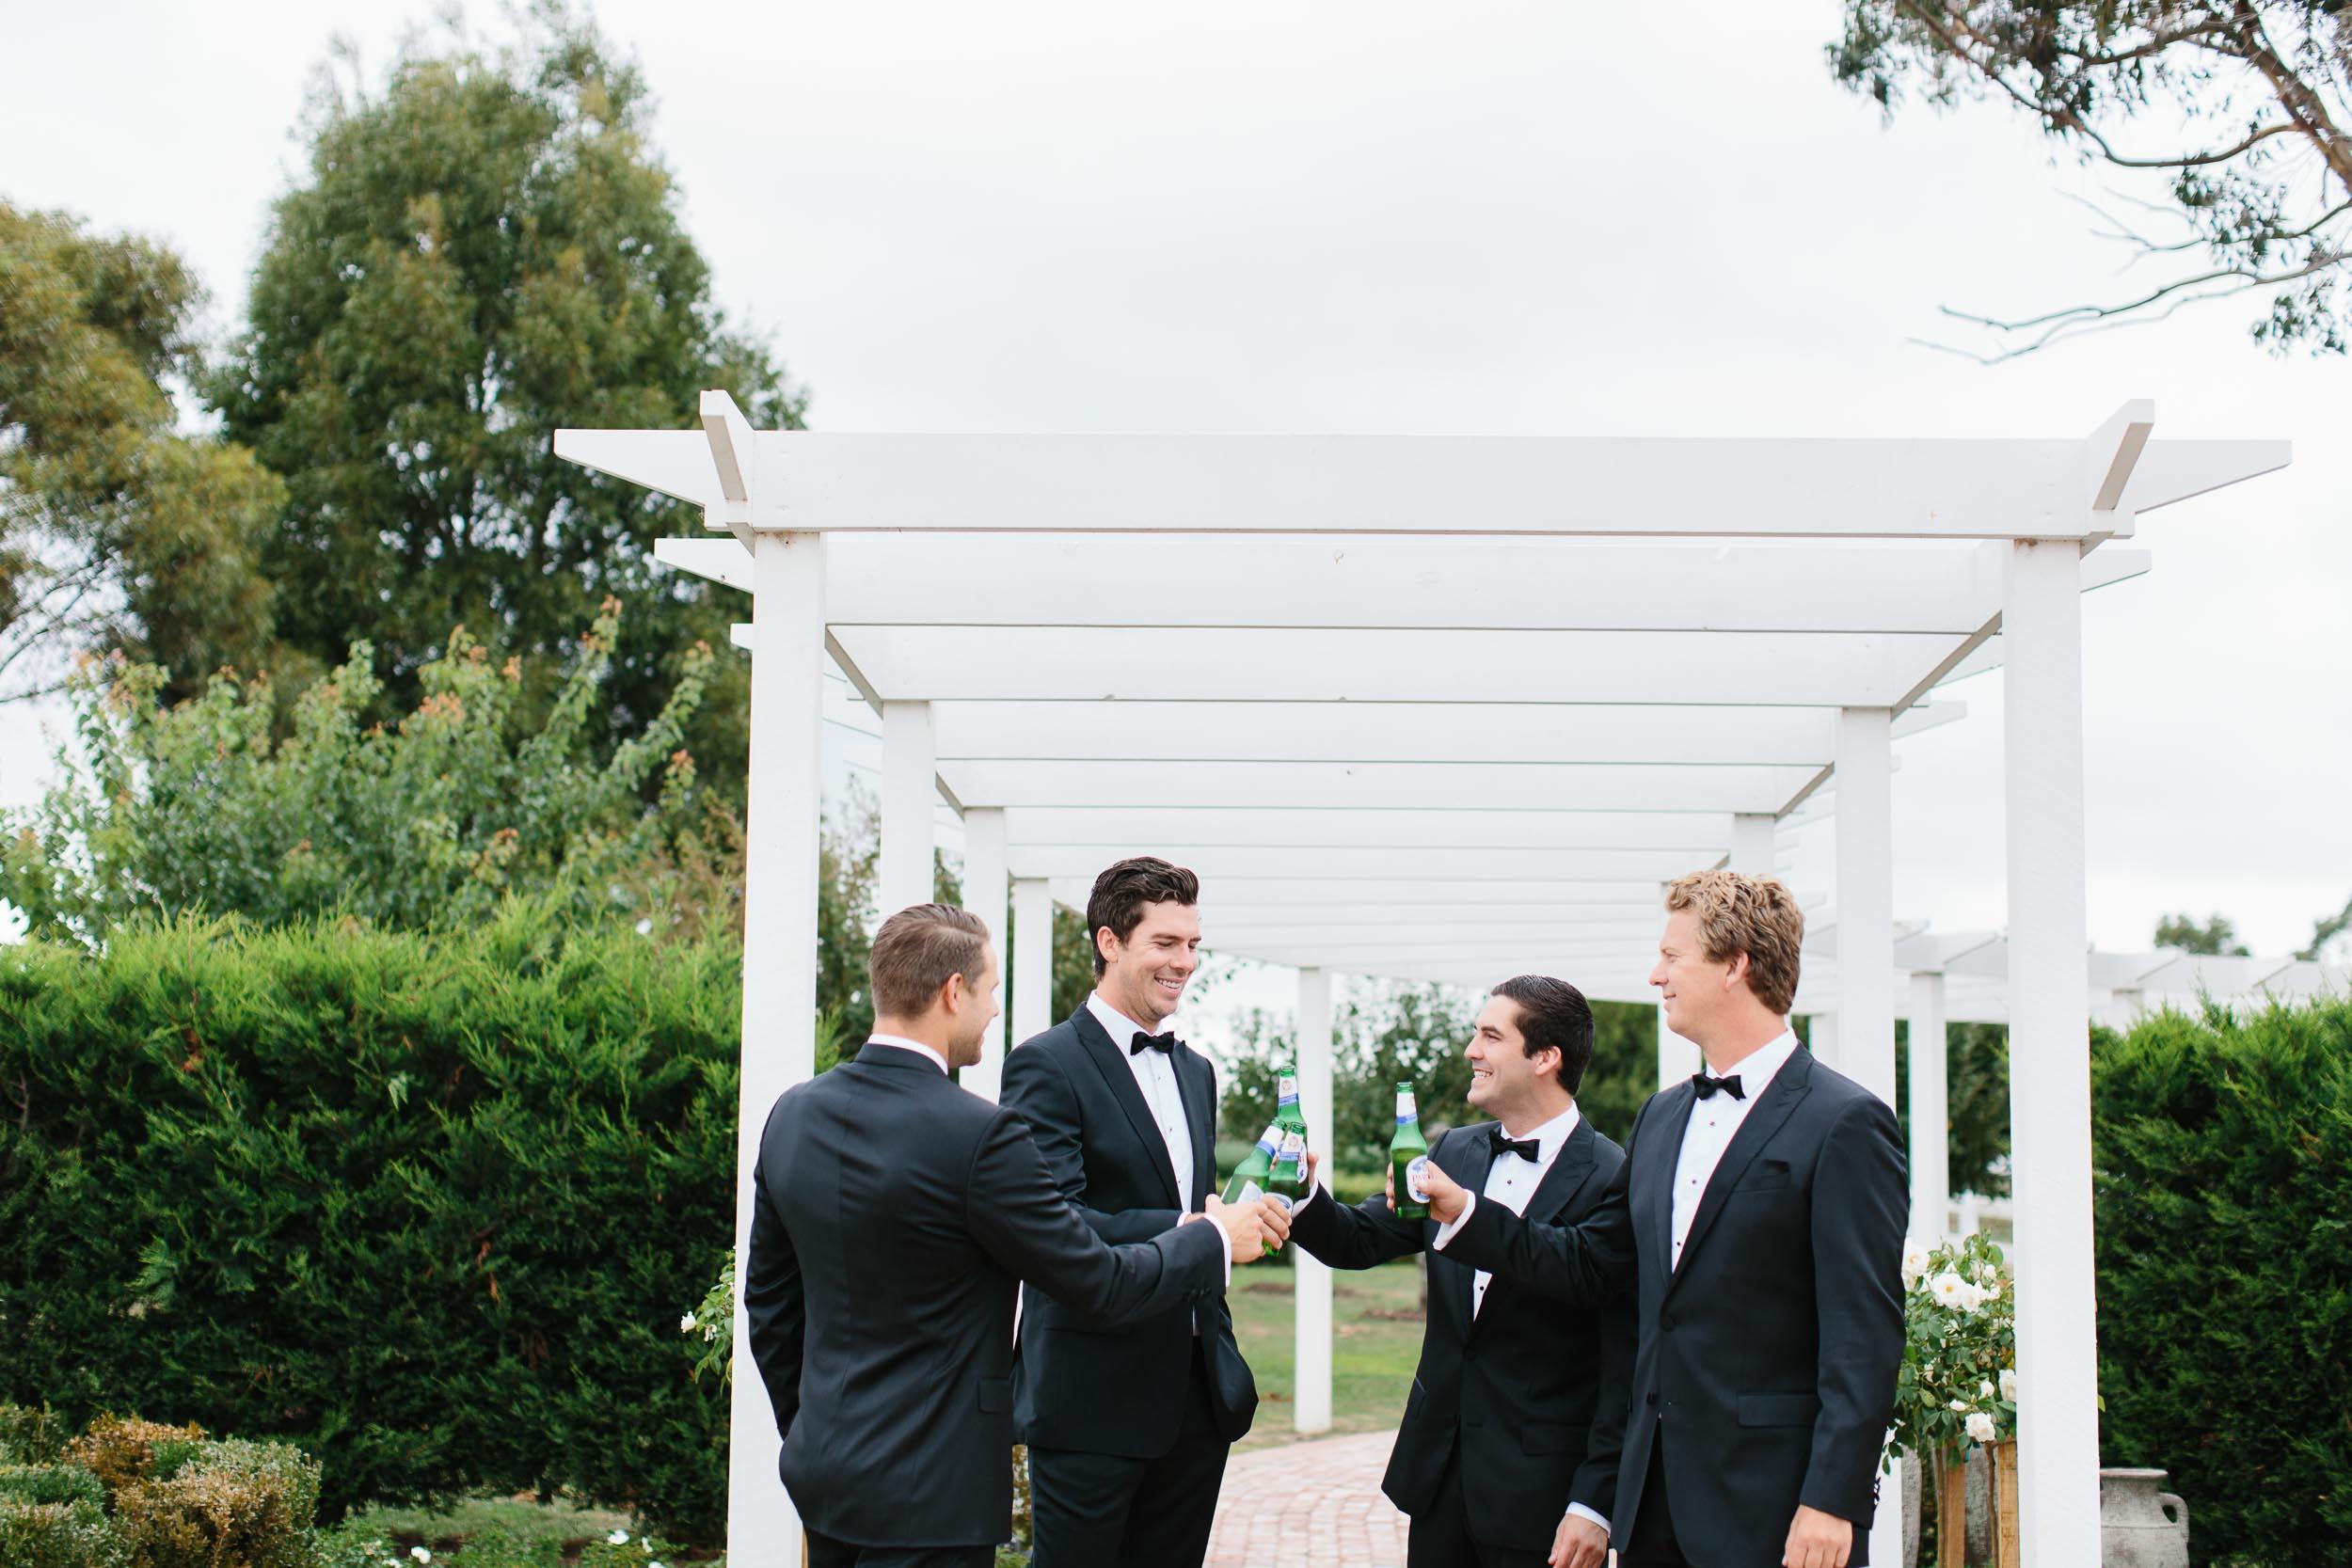 Kas-Richards-Mornington-Peninsula-Private-Property-Wedding-Marianna-Hardwick-Gown-48.jpg